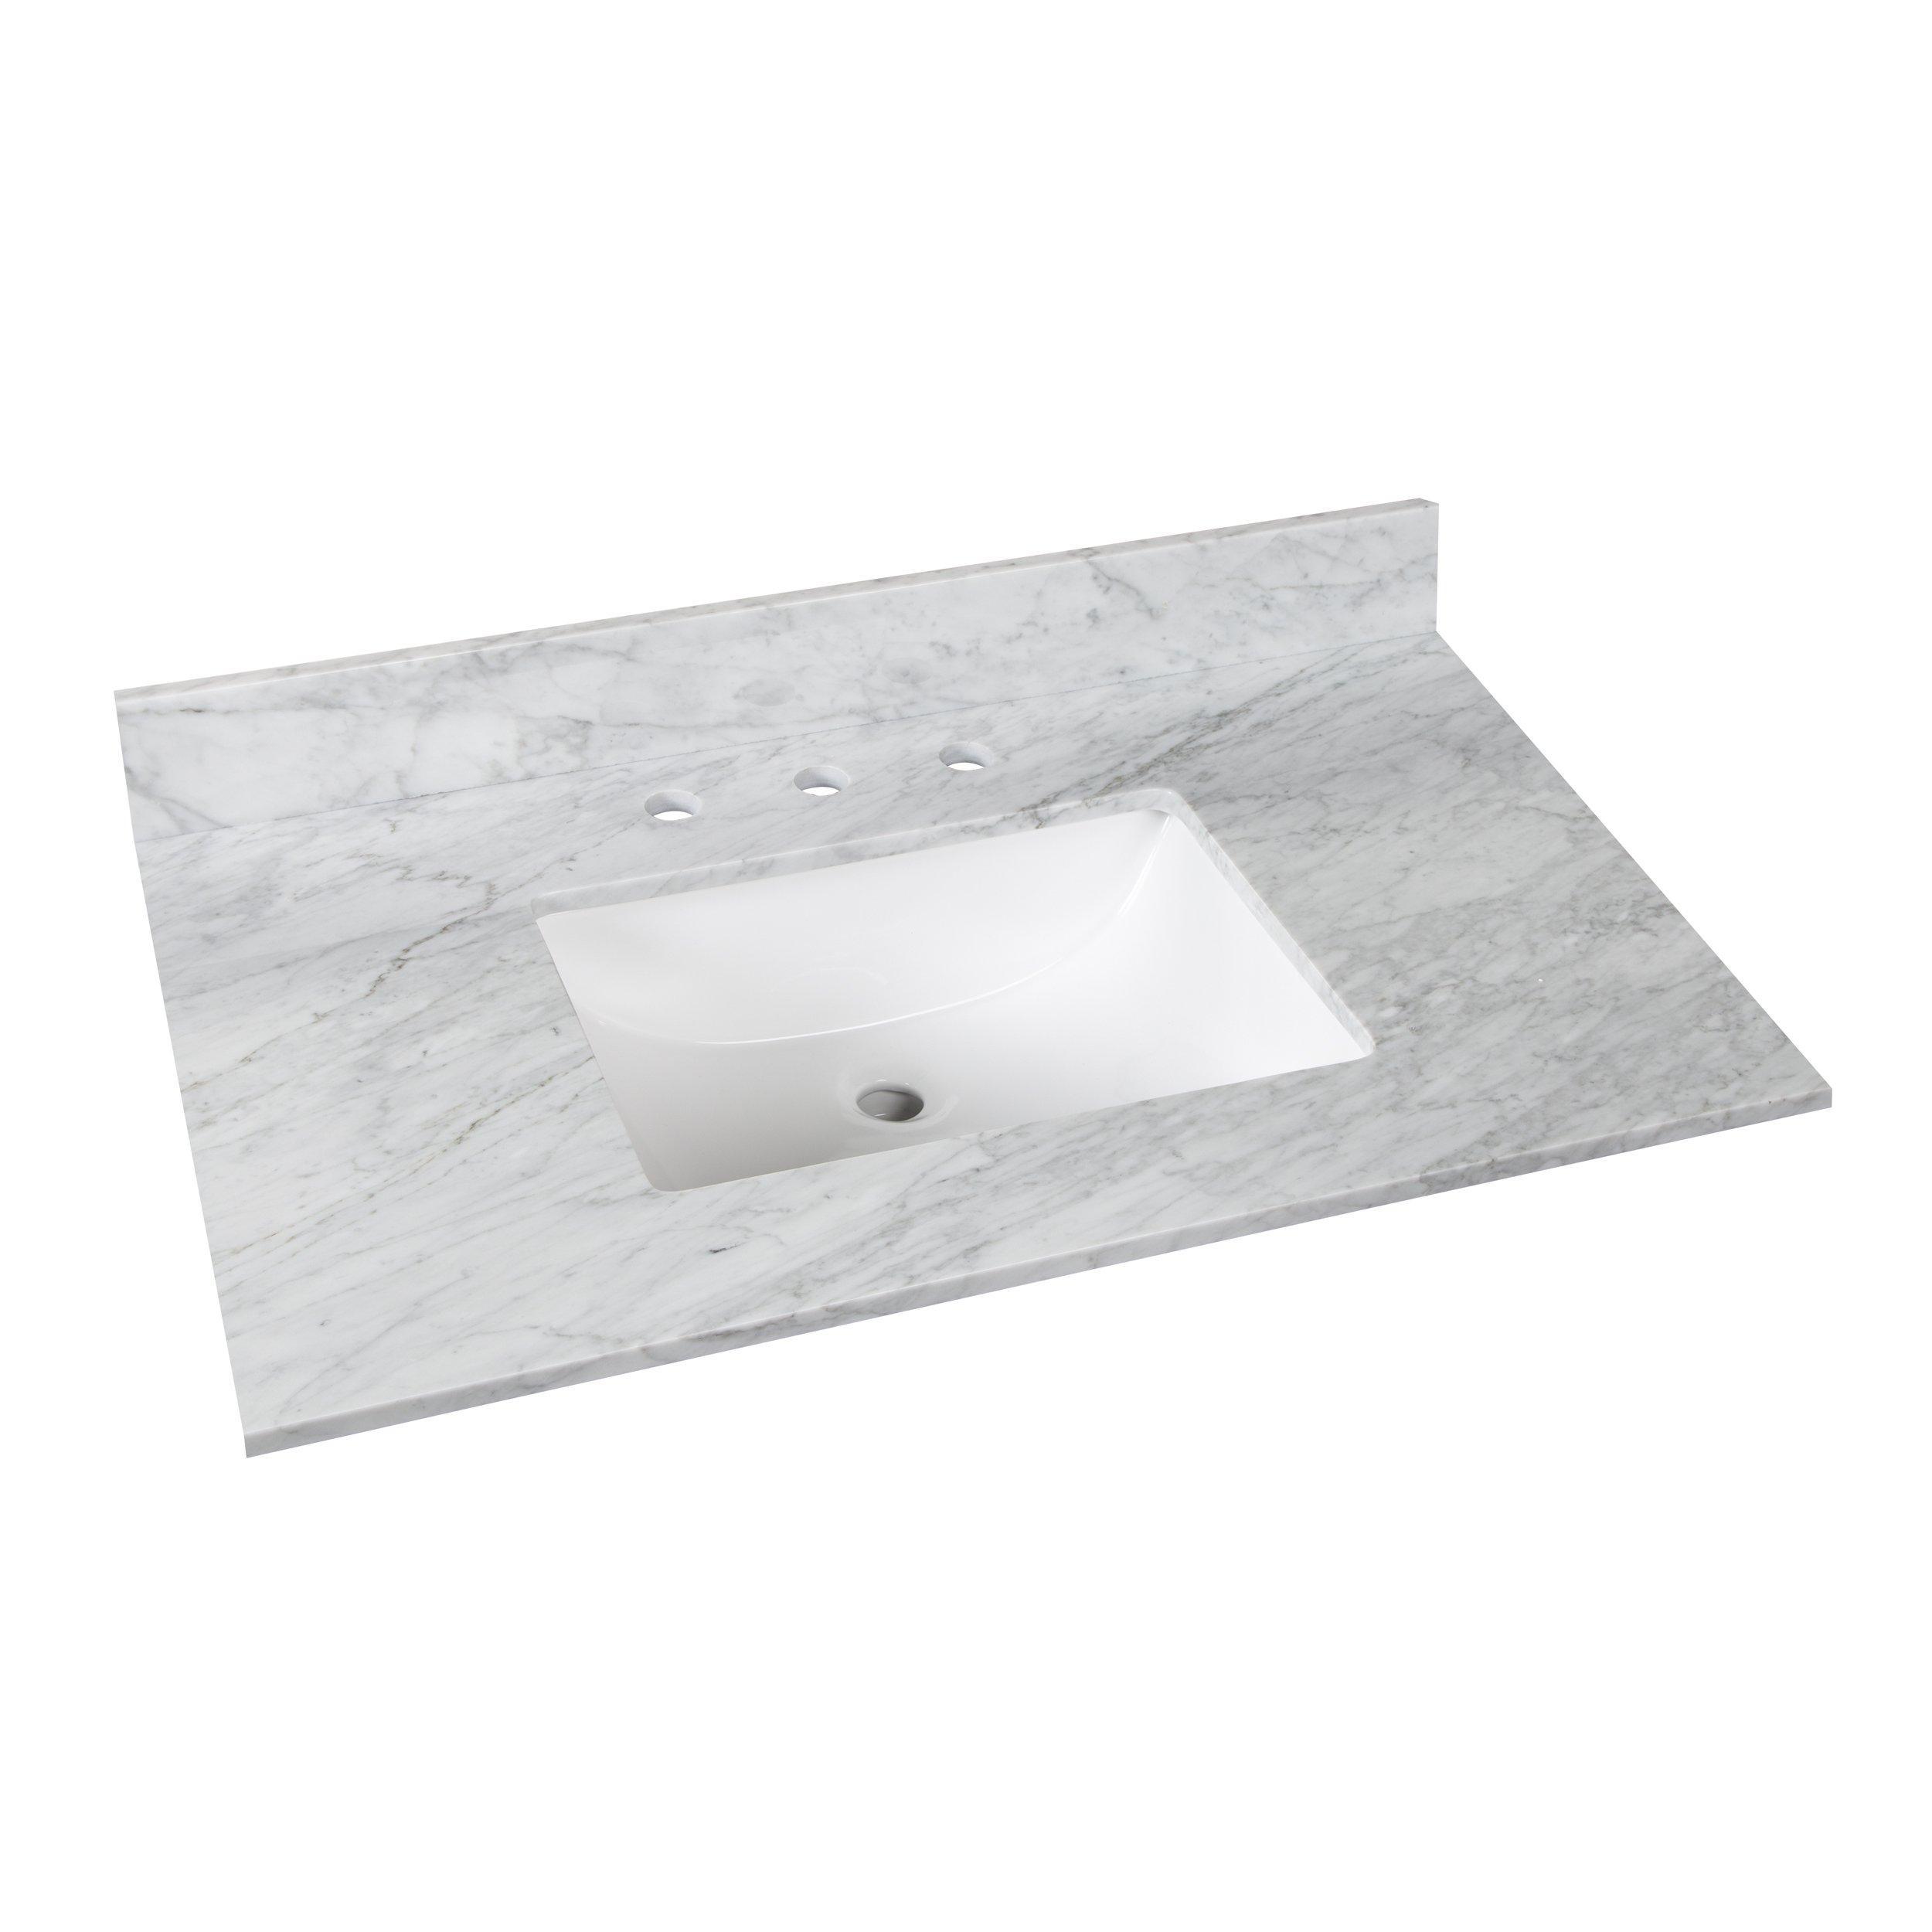 Bianco Carrara Marble 37 In Vanity Top Includes Backsplash 37in 100584135 Floor And Decor